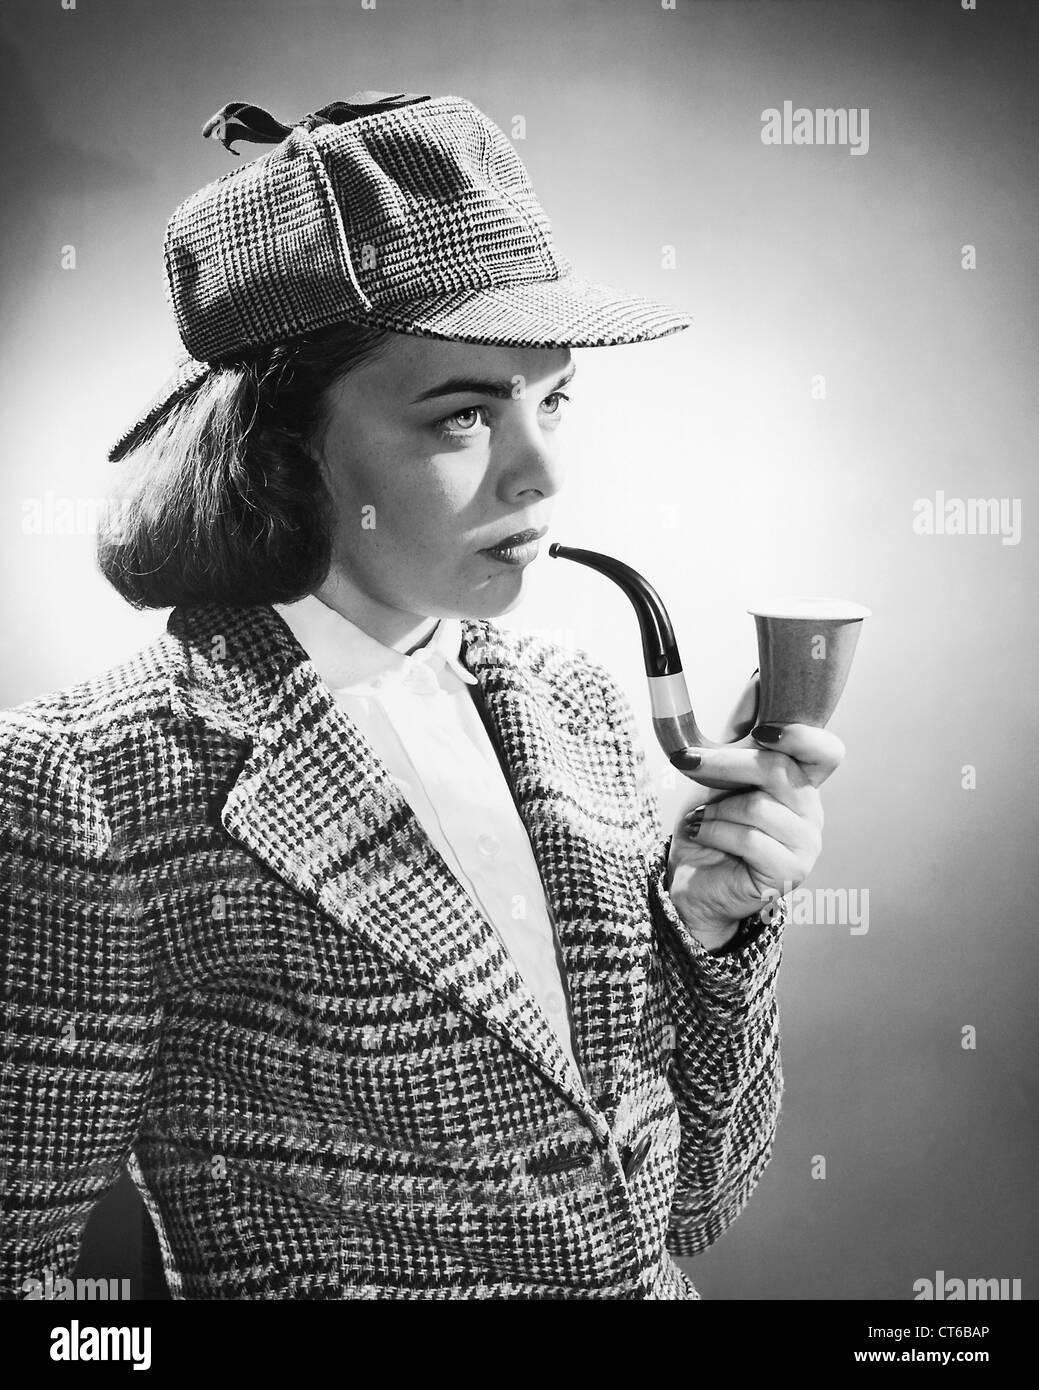 vintage-female-sherlock-holmes-detective